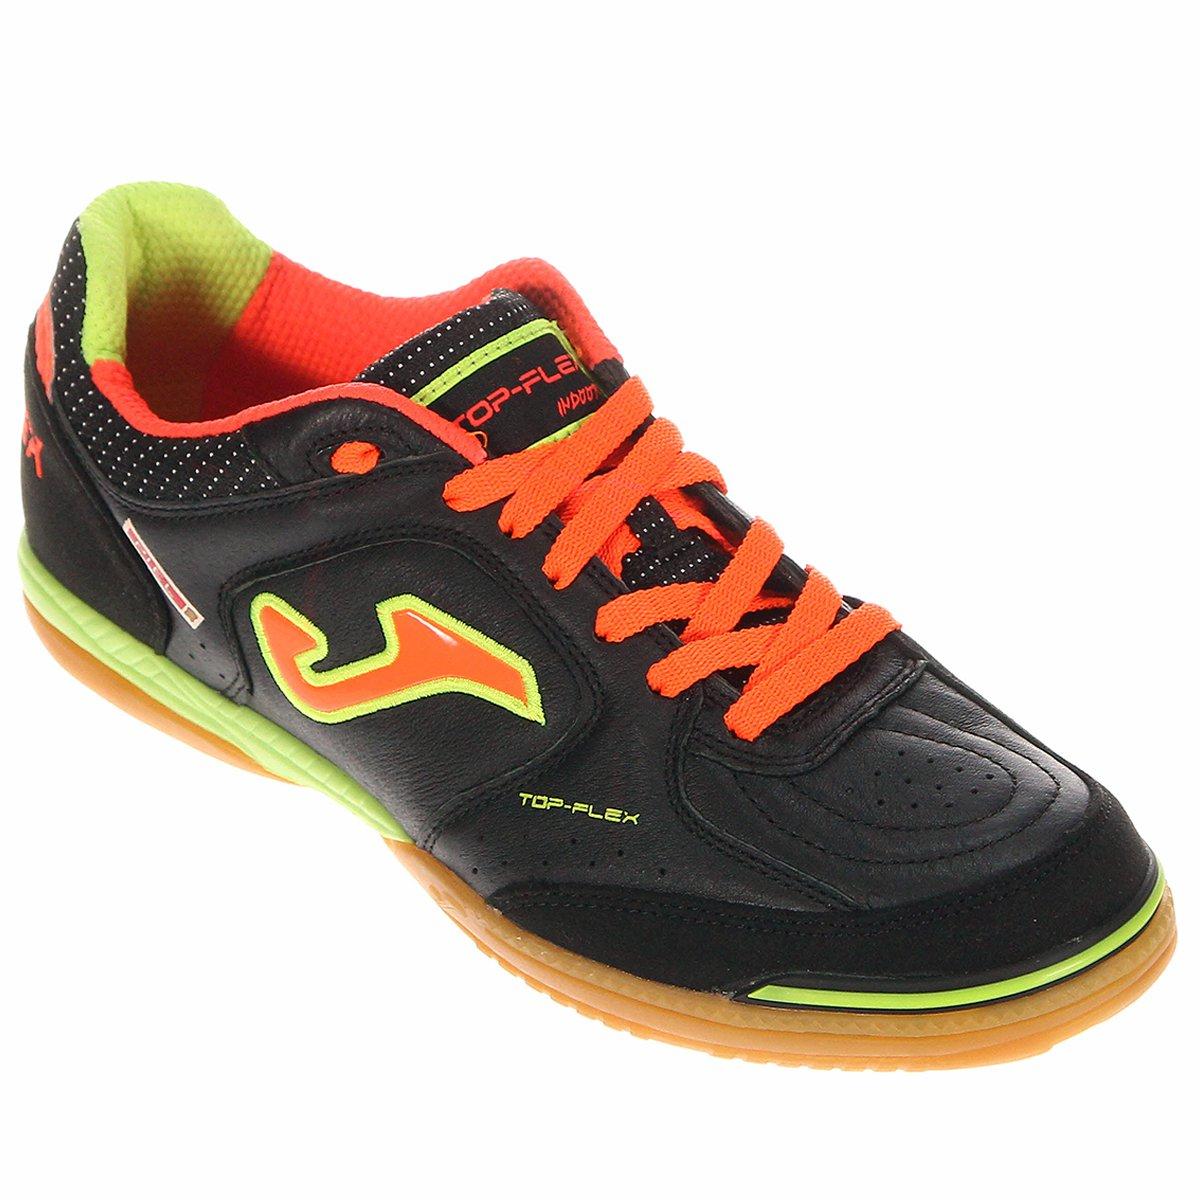 Chuteira Joma Top Flex Futsal - Compre Agora  d02f90ae0839b